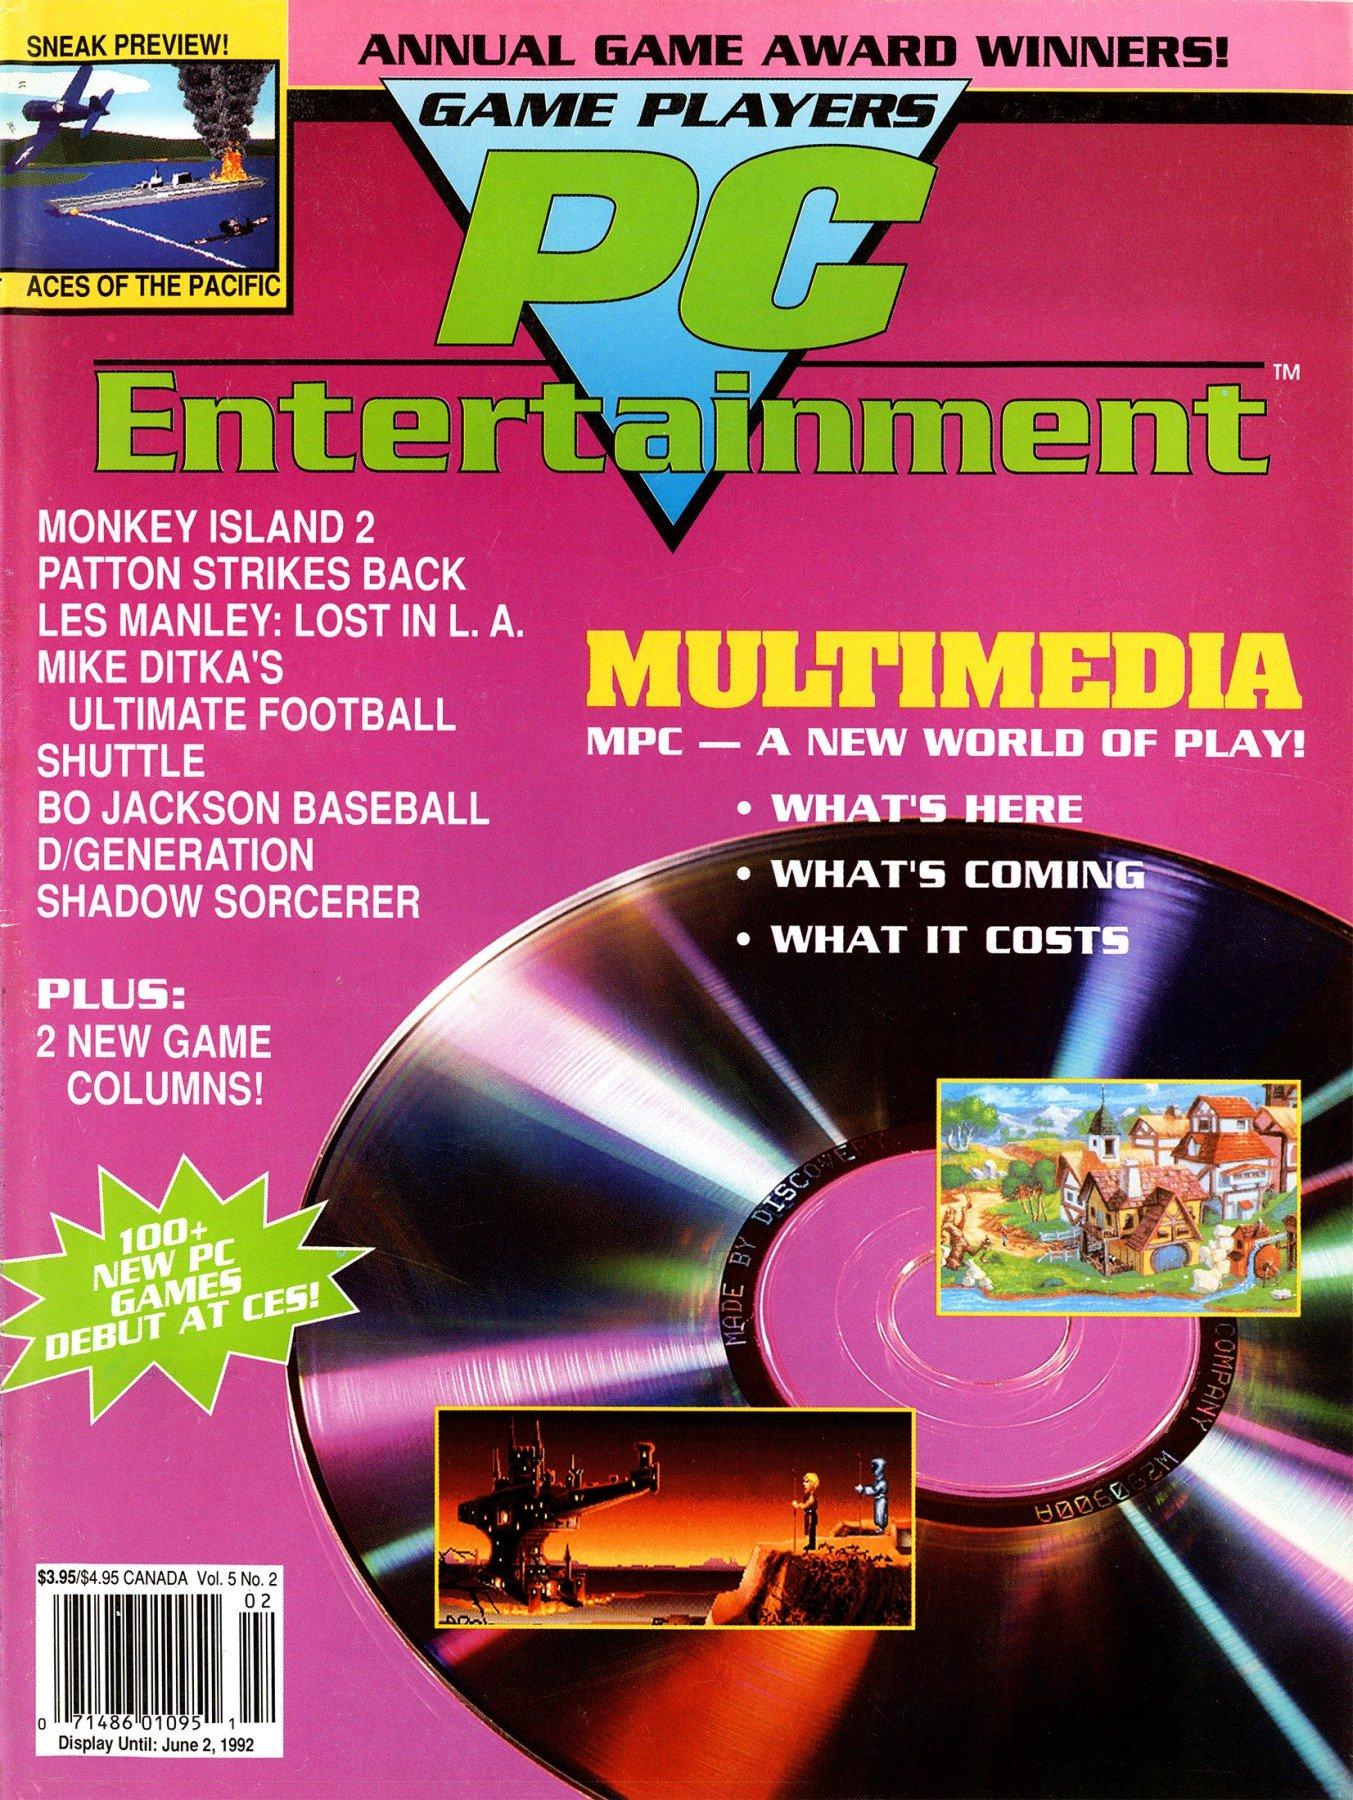 Game Players PC Entertainment Vol.5 No.2 (March/April 1992)